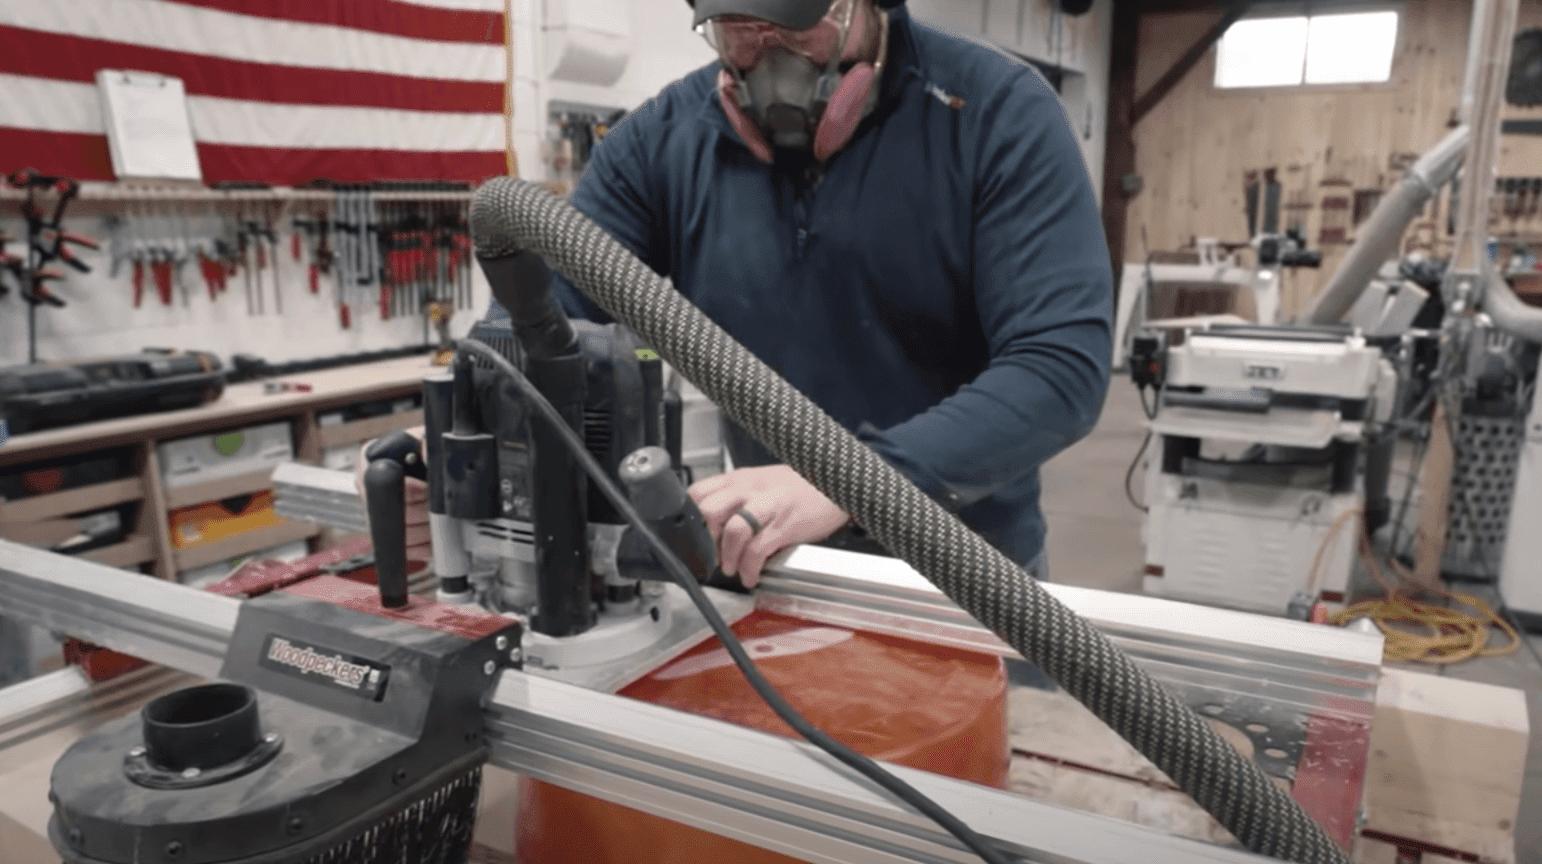 epoxy flattening jig